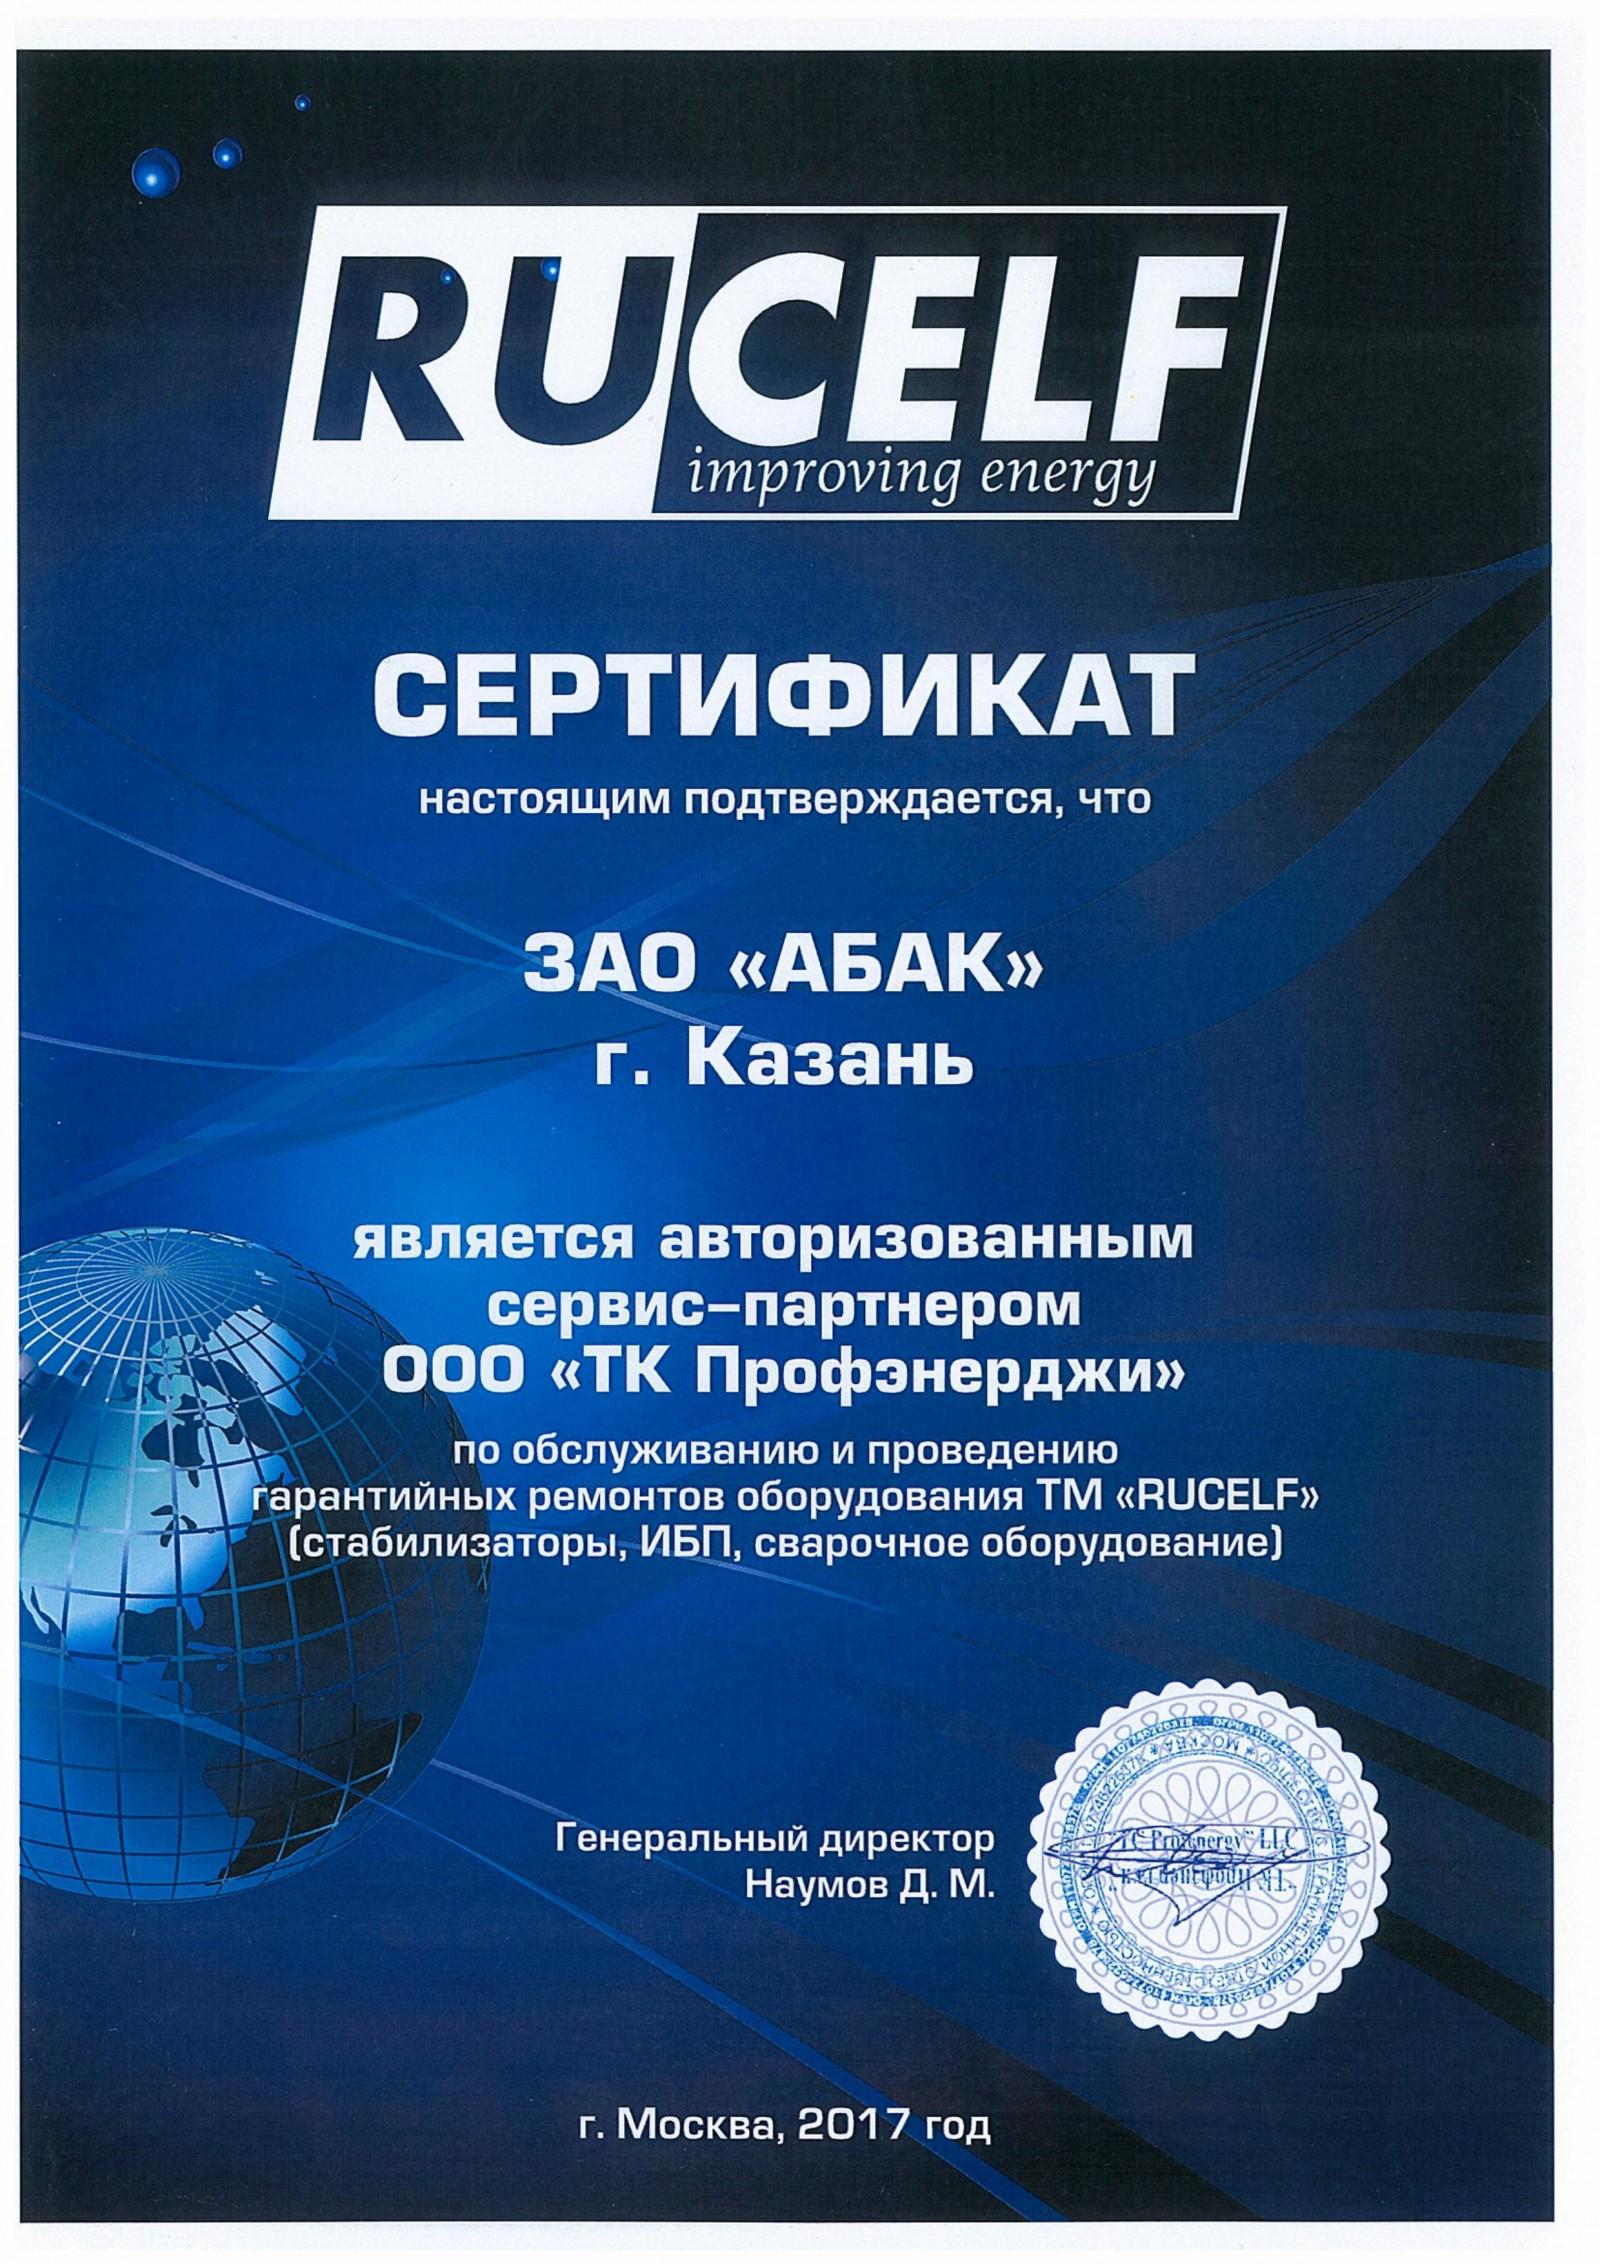 RUCELF - Профэнерджи